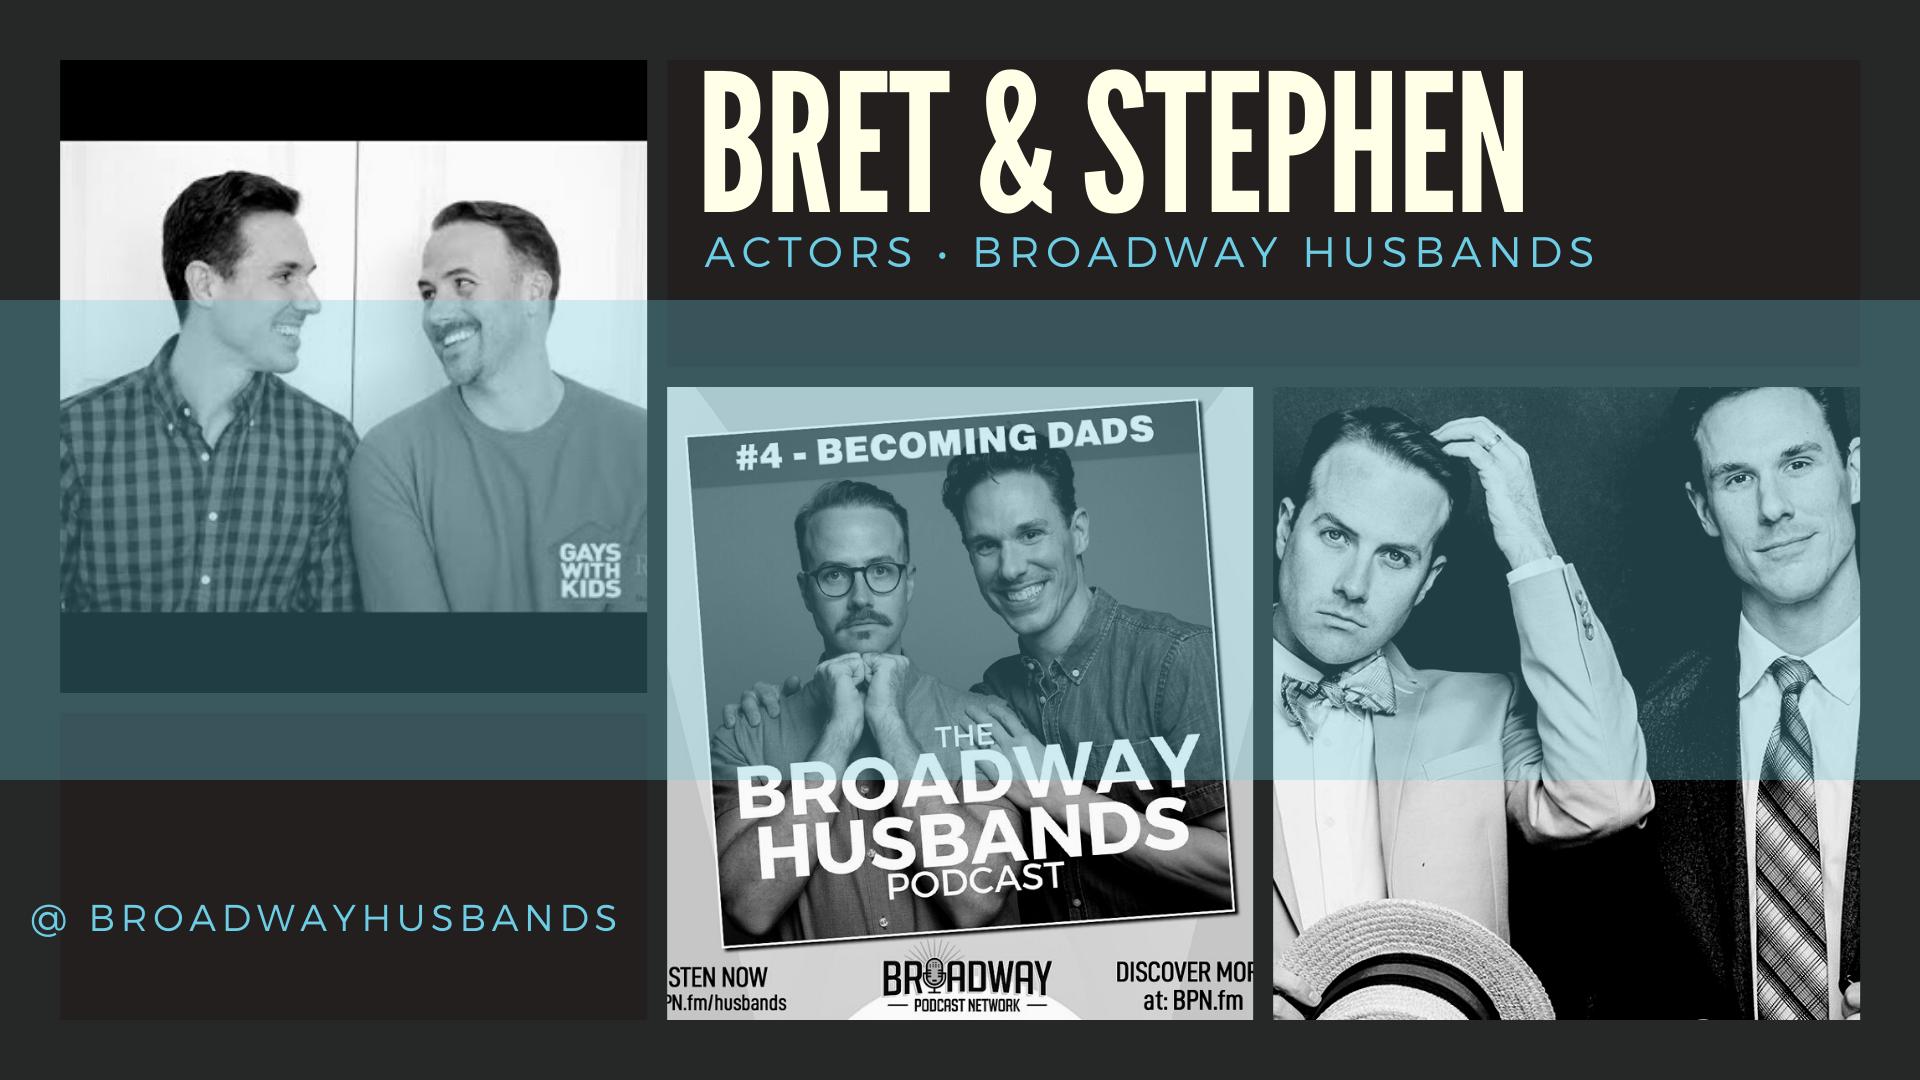 Broadway Husbands